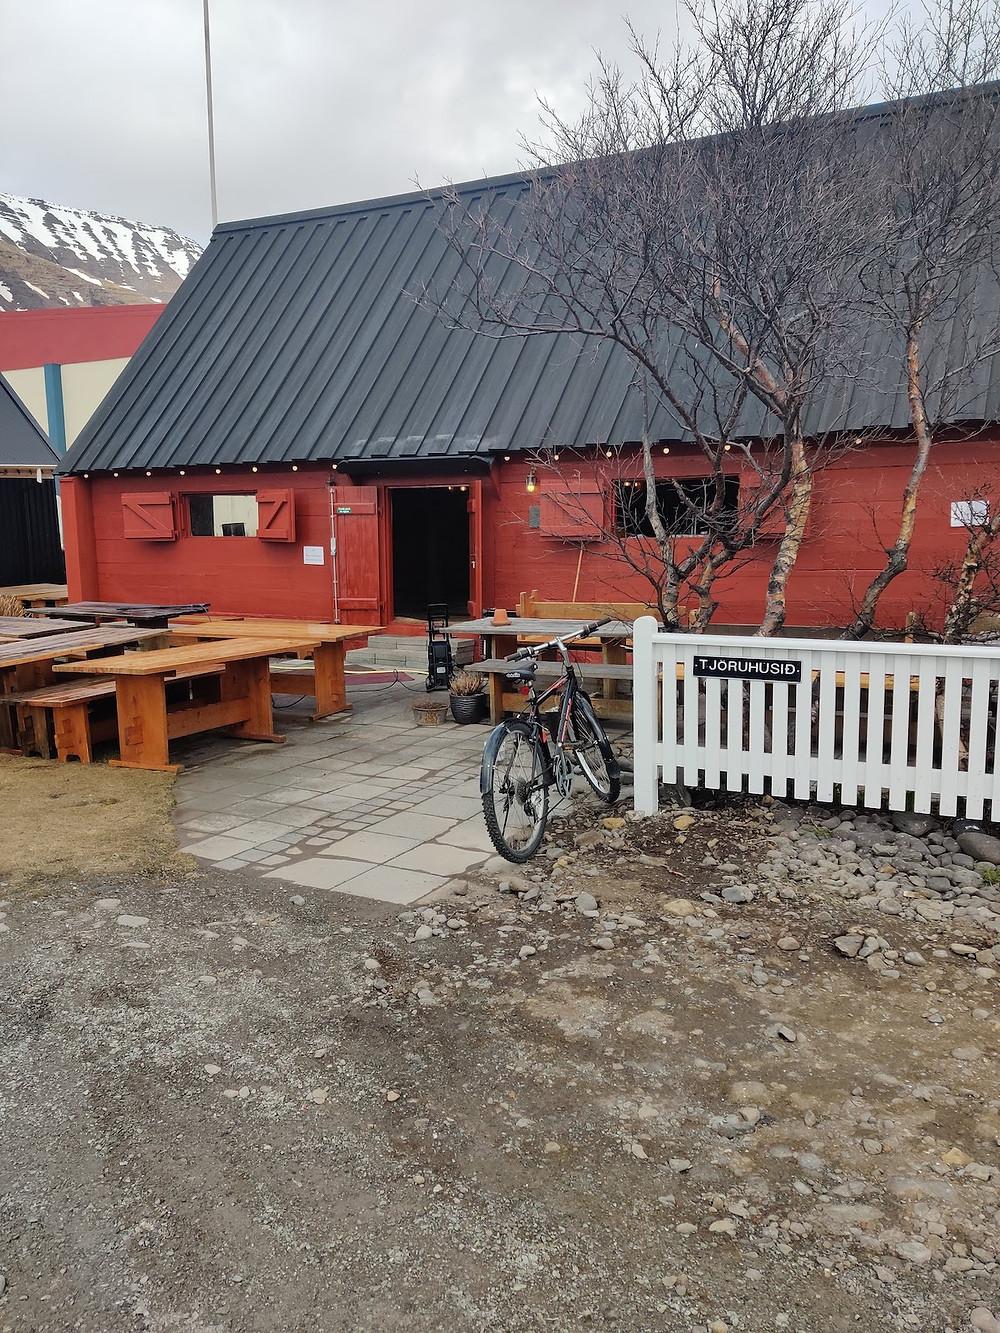 Tjoruhusid restaurant down by the Dokkan harbour in Isafjordur